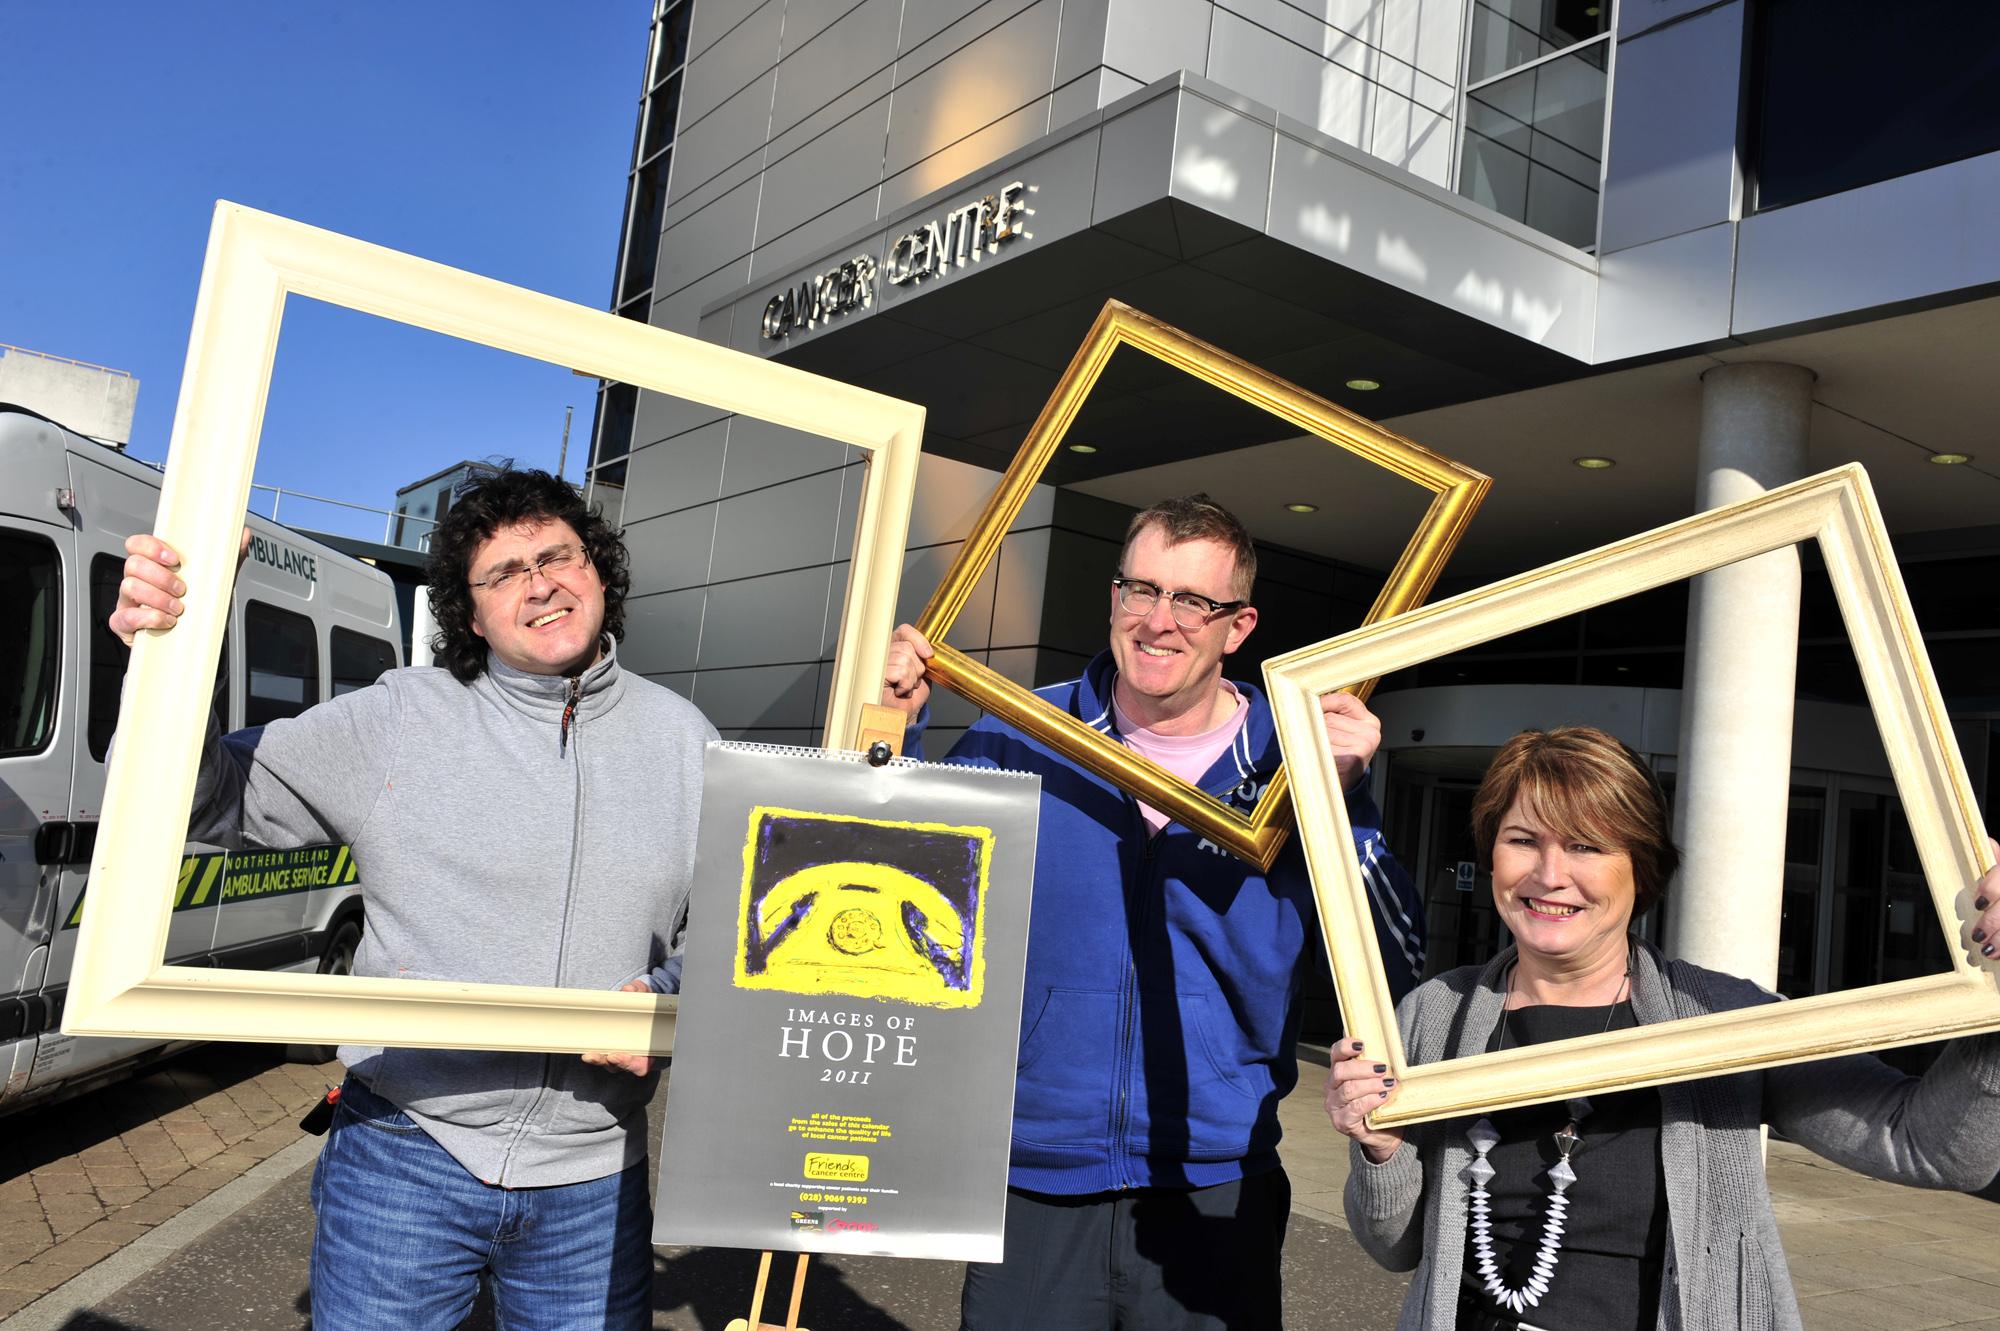 Charity support from Belfast restaurants